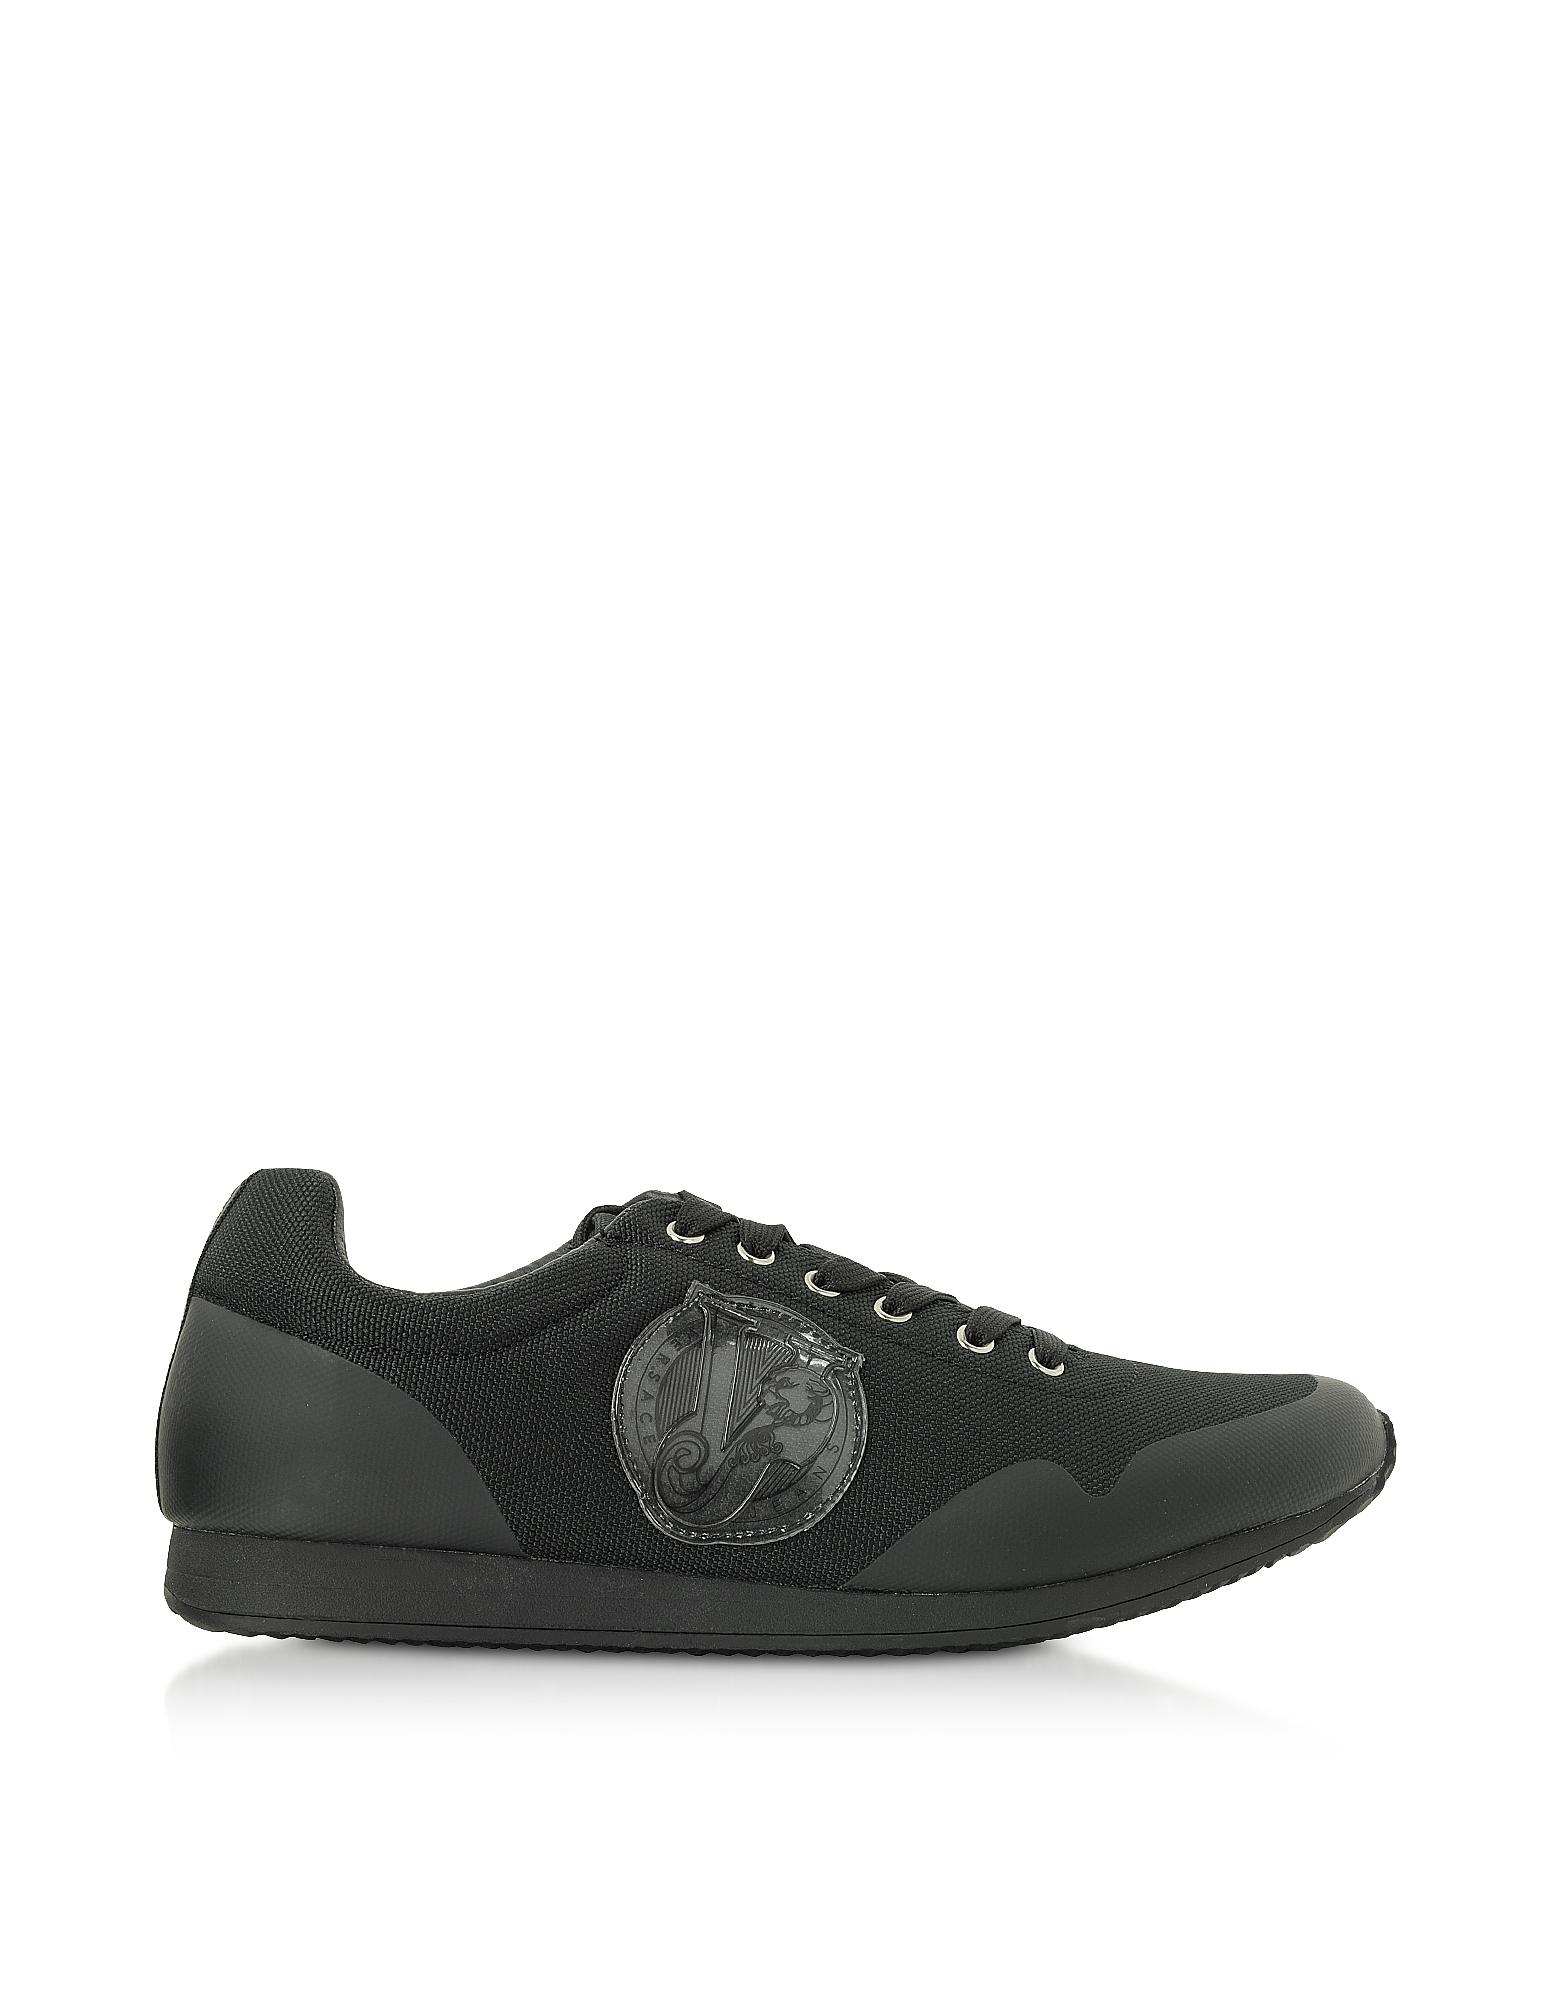 Versace Jeans Designer Shoes, Black Coated Nylon Men's Running Sneakers